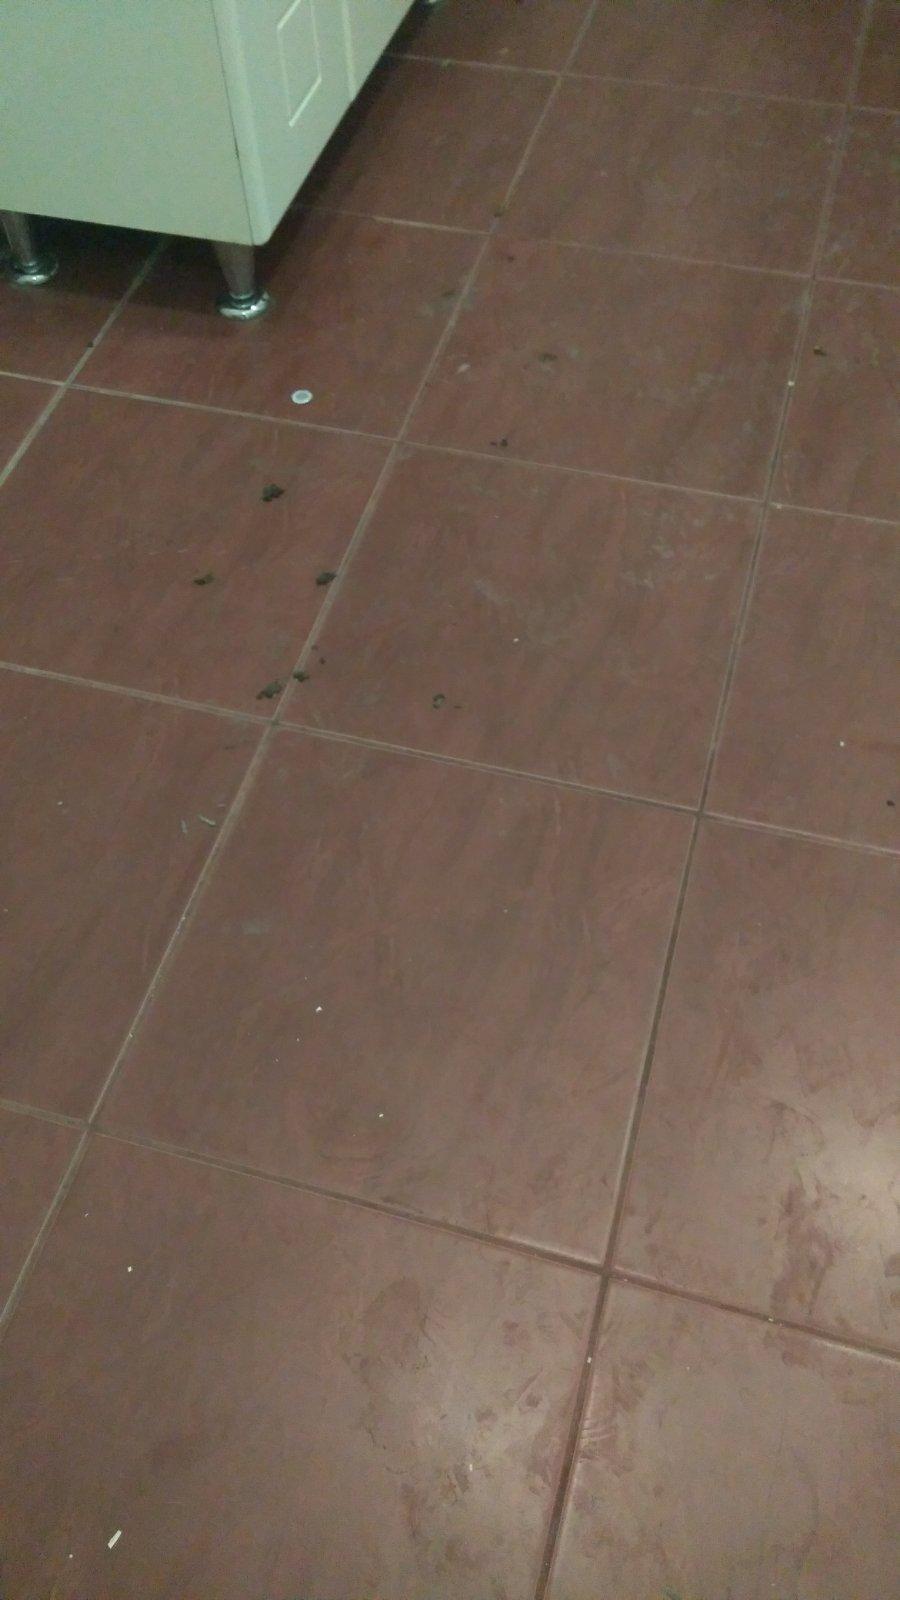 уборка квартир, клининговые услуги киев